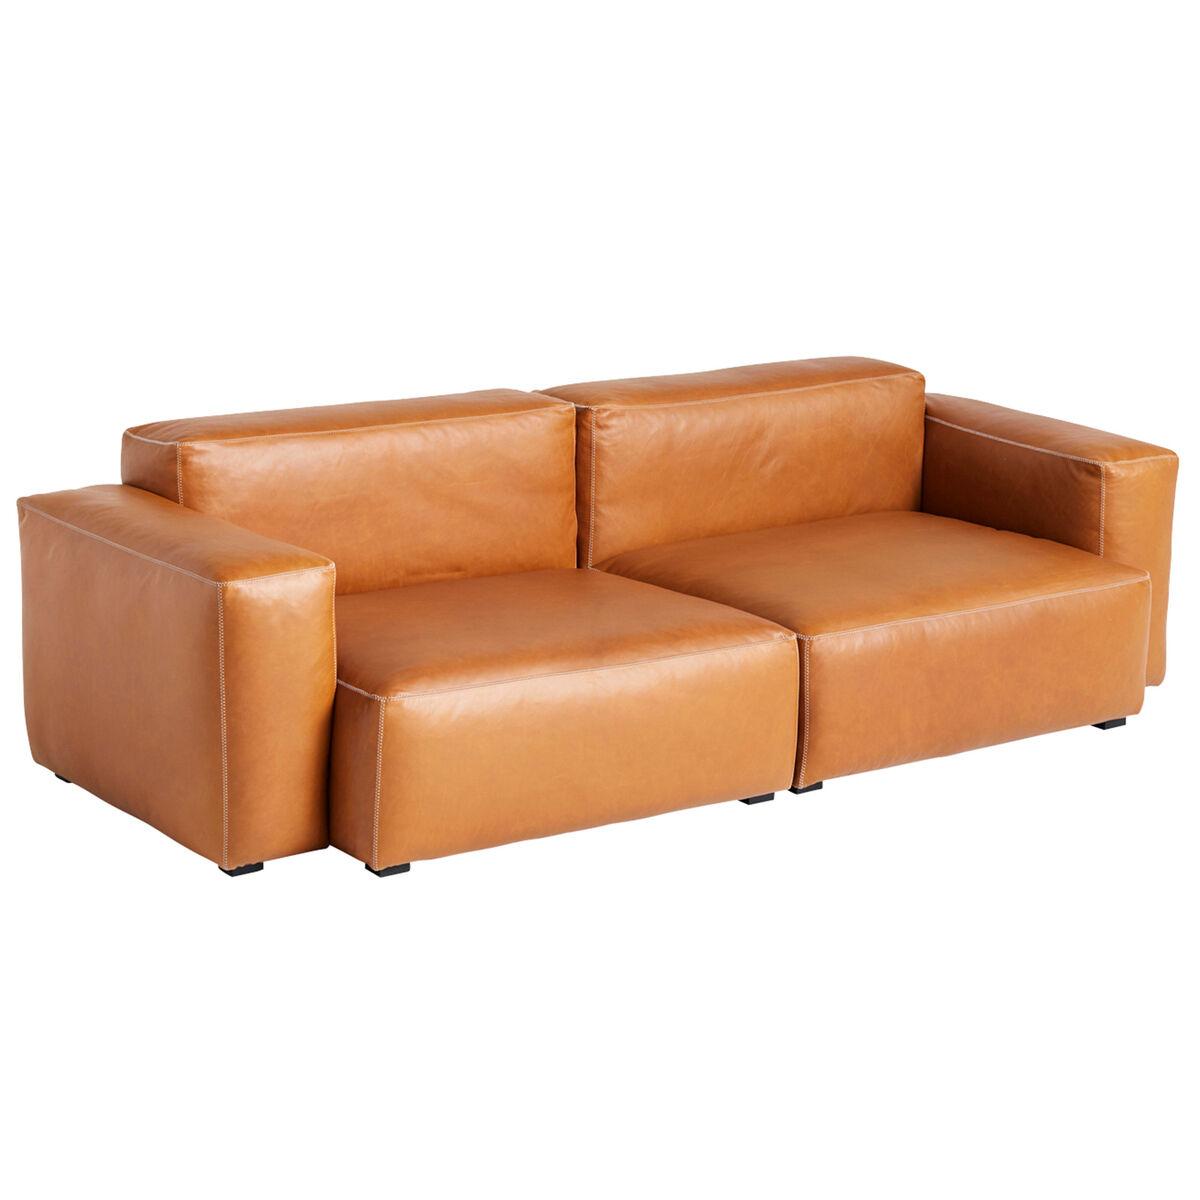 Hay Mags Soft sohva 2,5-ist/228 cm, matala käsinoja, Silk 0250